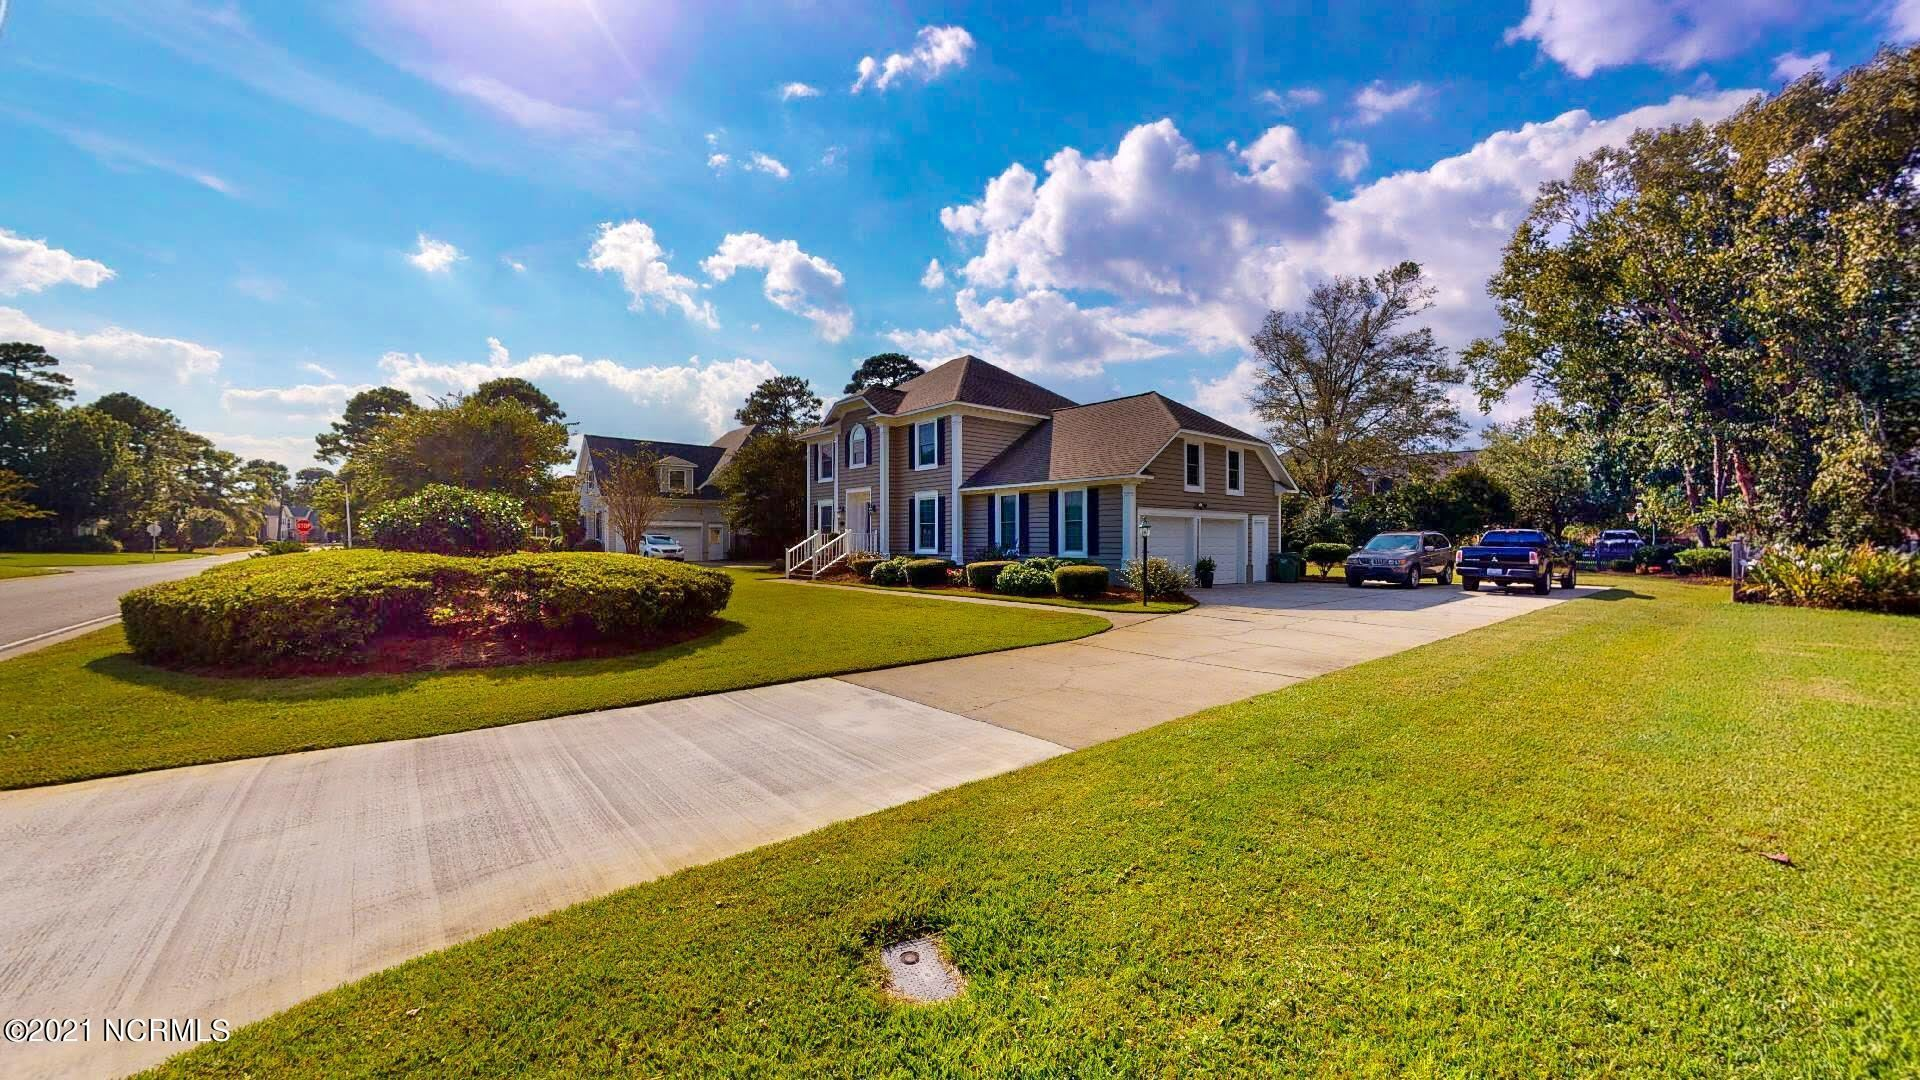 Photo of 3320 Amber Drive, Wilmington, NC 28409 (MLS # 100295269)